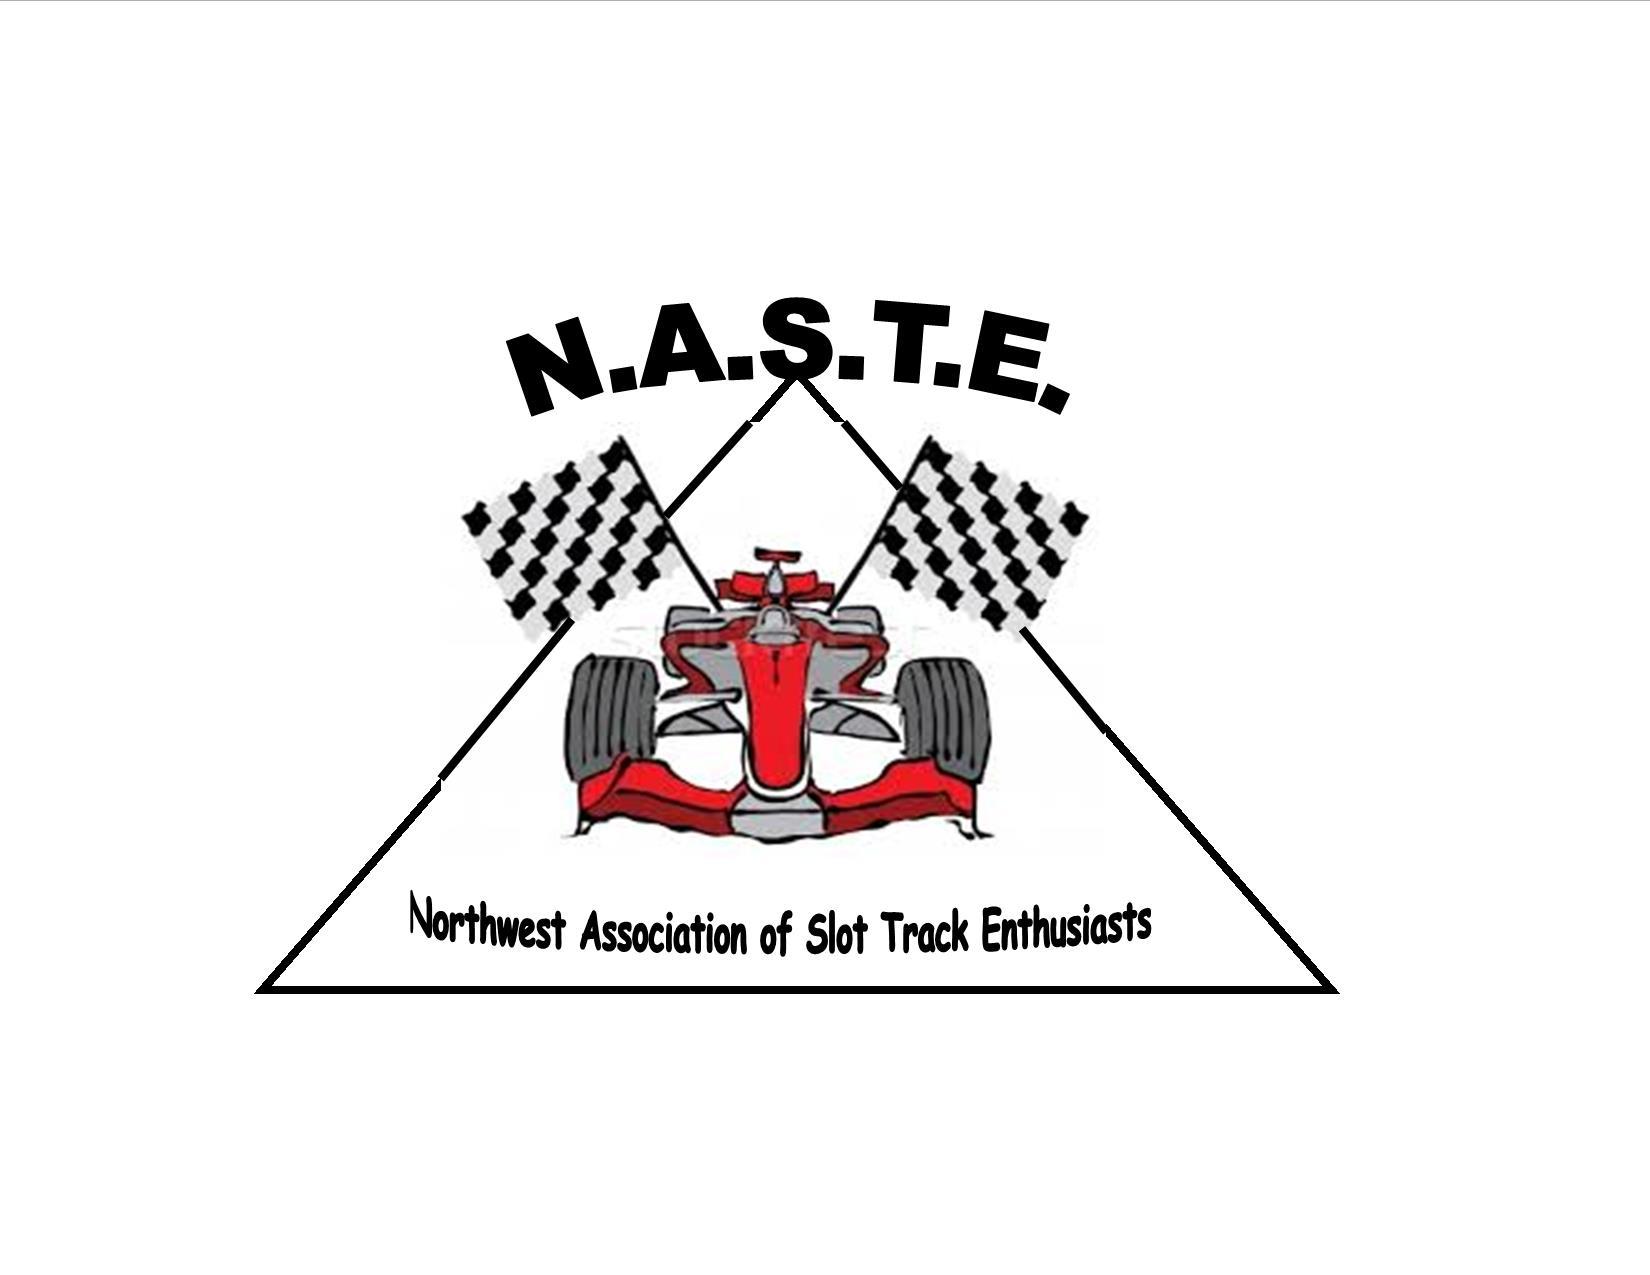 http://www.naste.org/members/bill/DennisHart3b.jpg